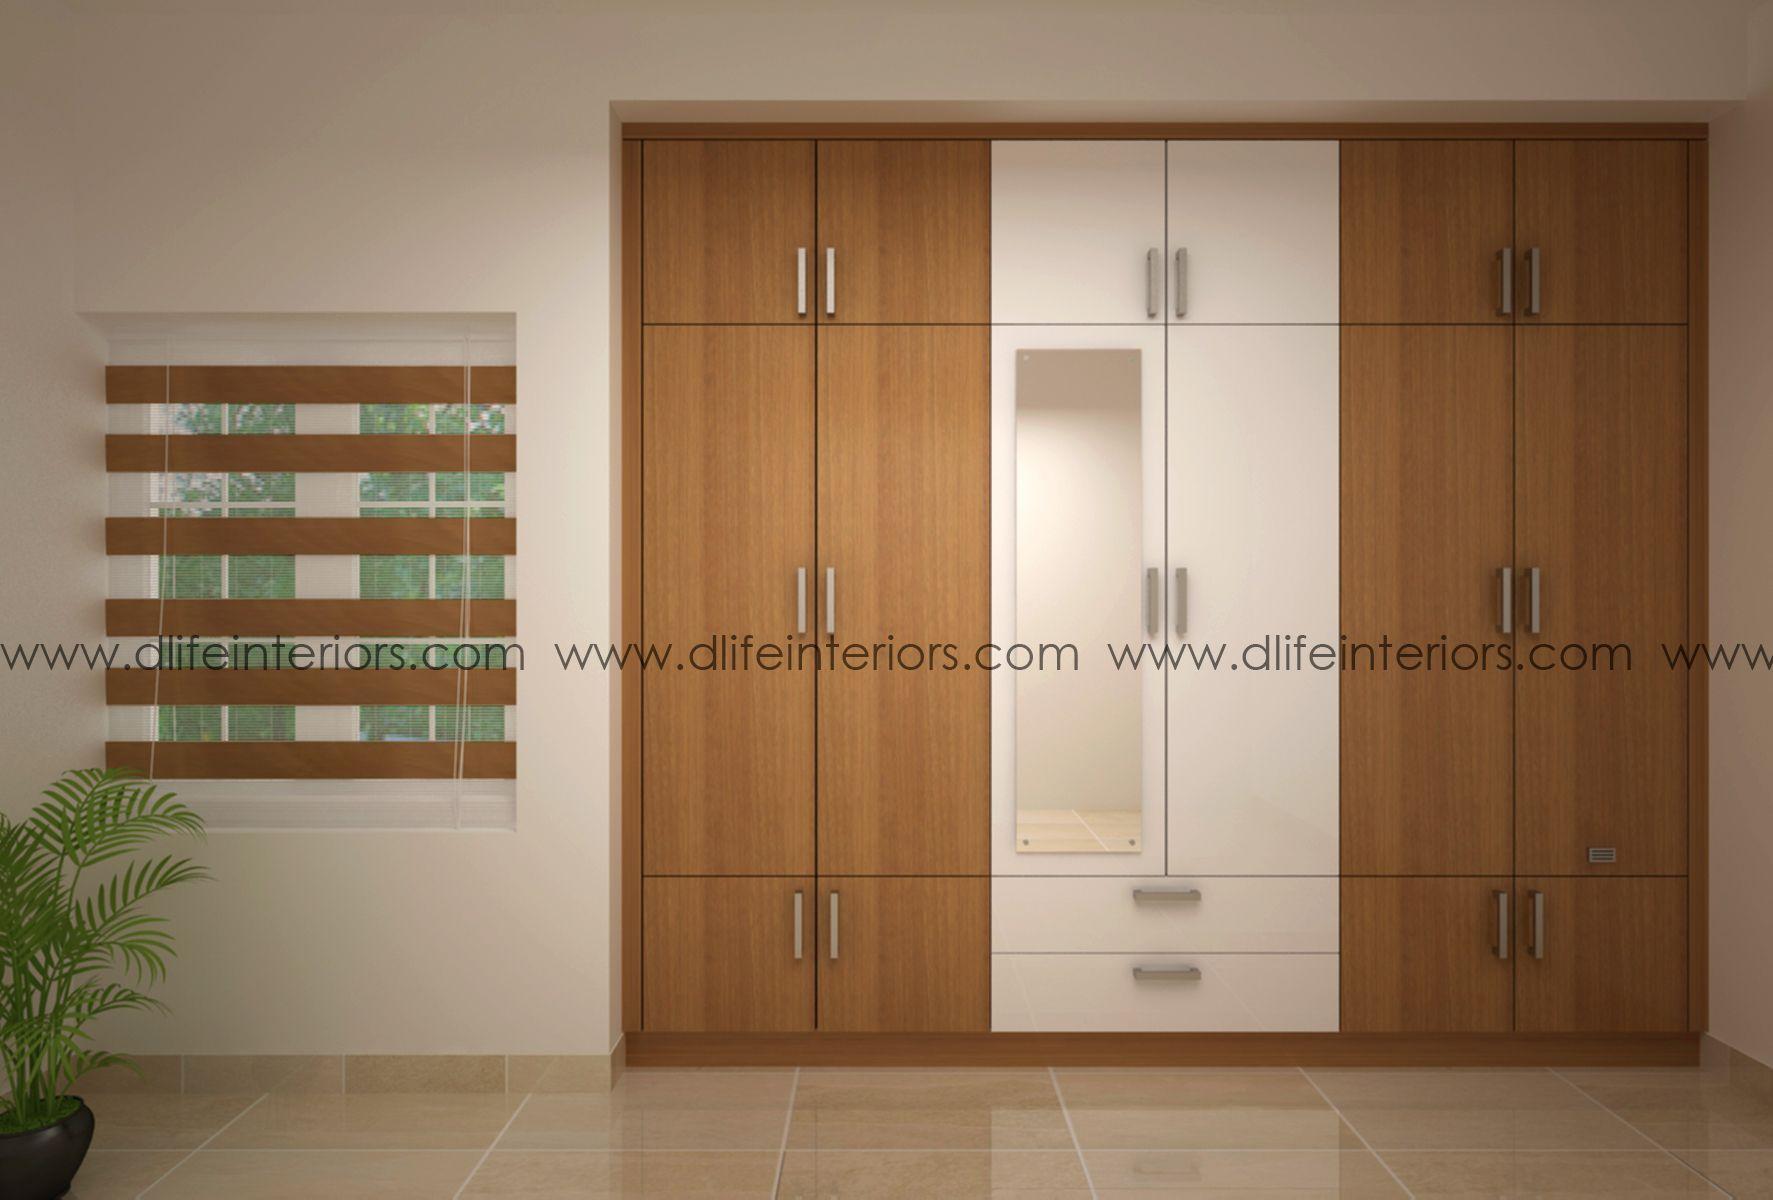 Best Bedroom Wardrobes From Top Interior Design Company D Life 400 x 300